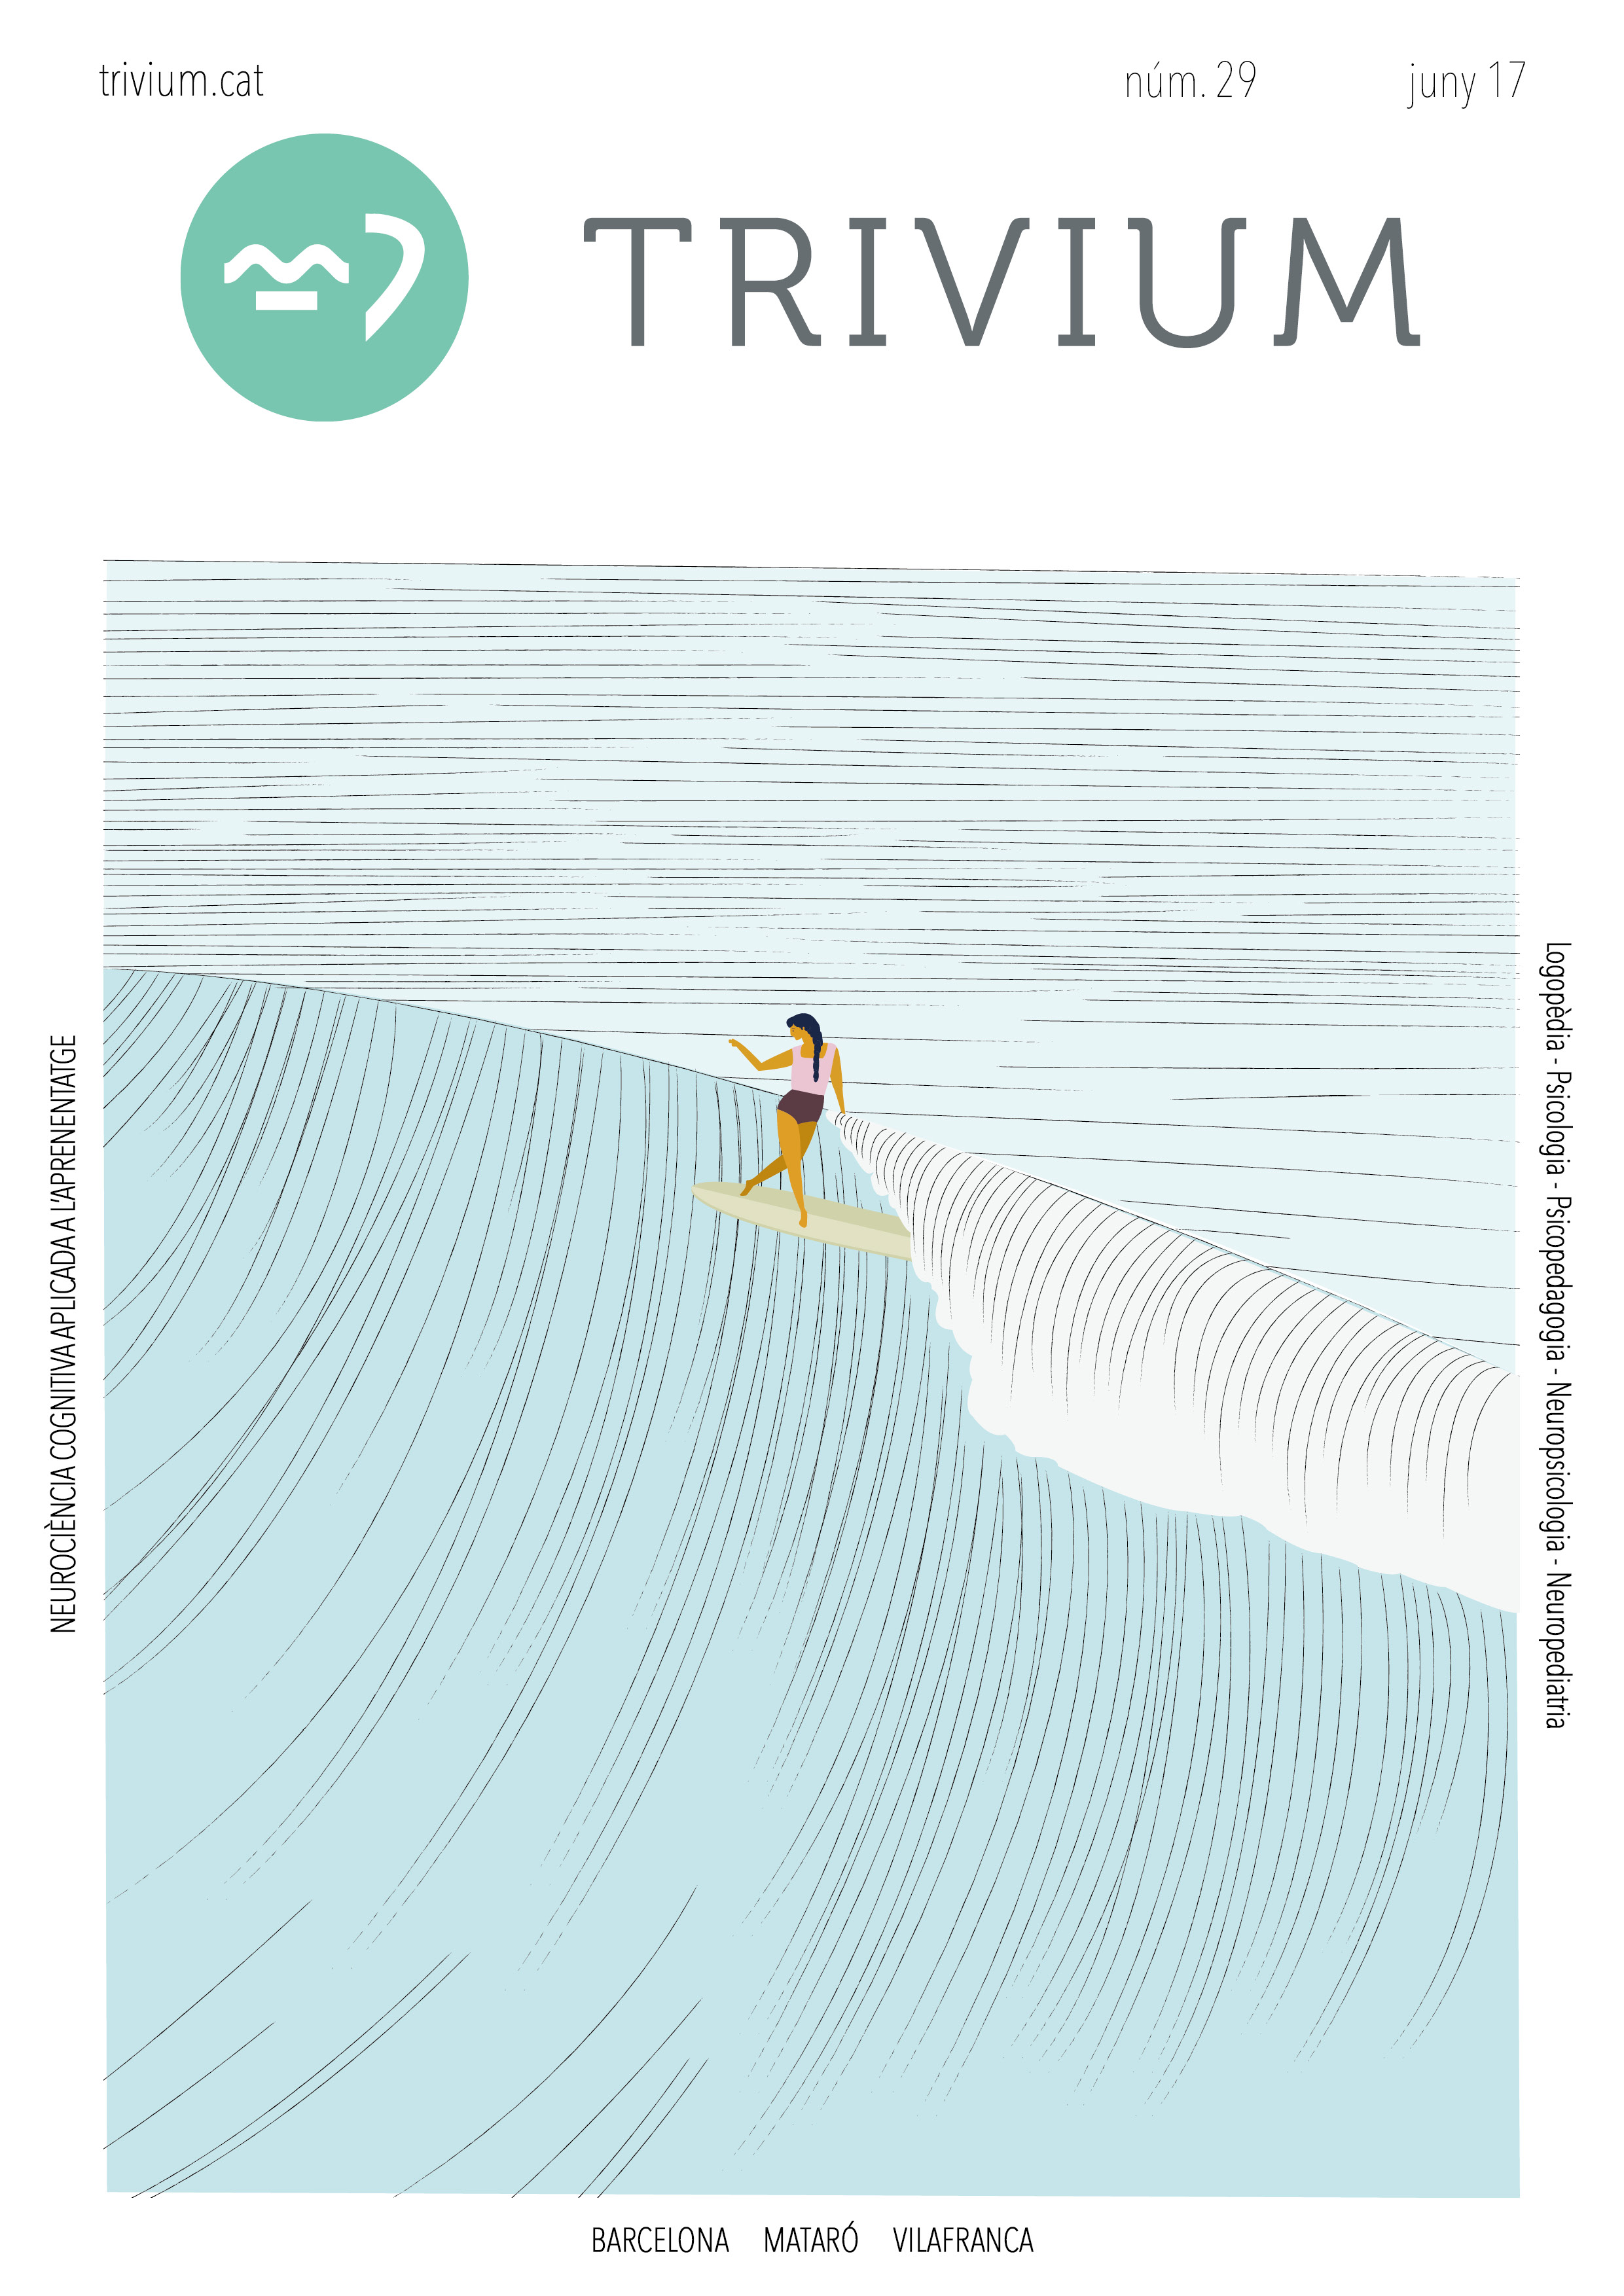 portada trivium - juny - aprenentatge - barcelona - logopèdia - psicologia